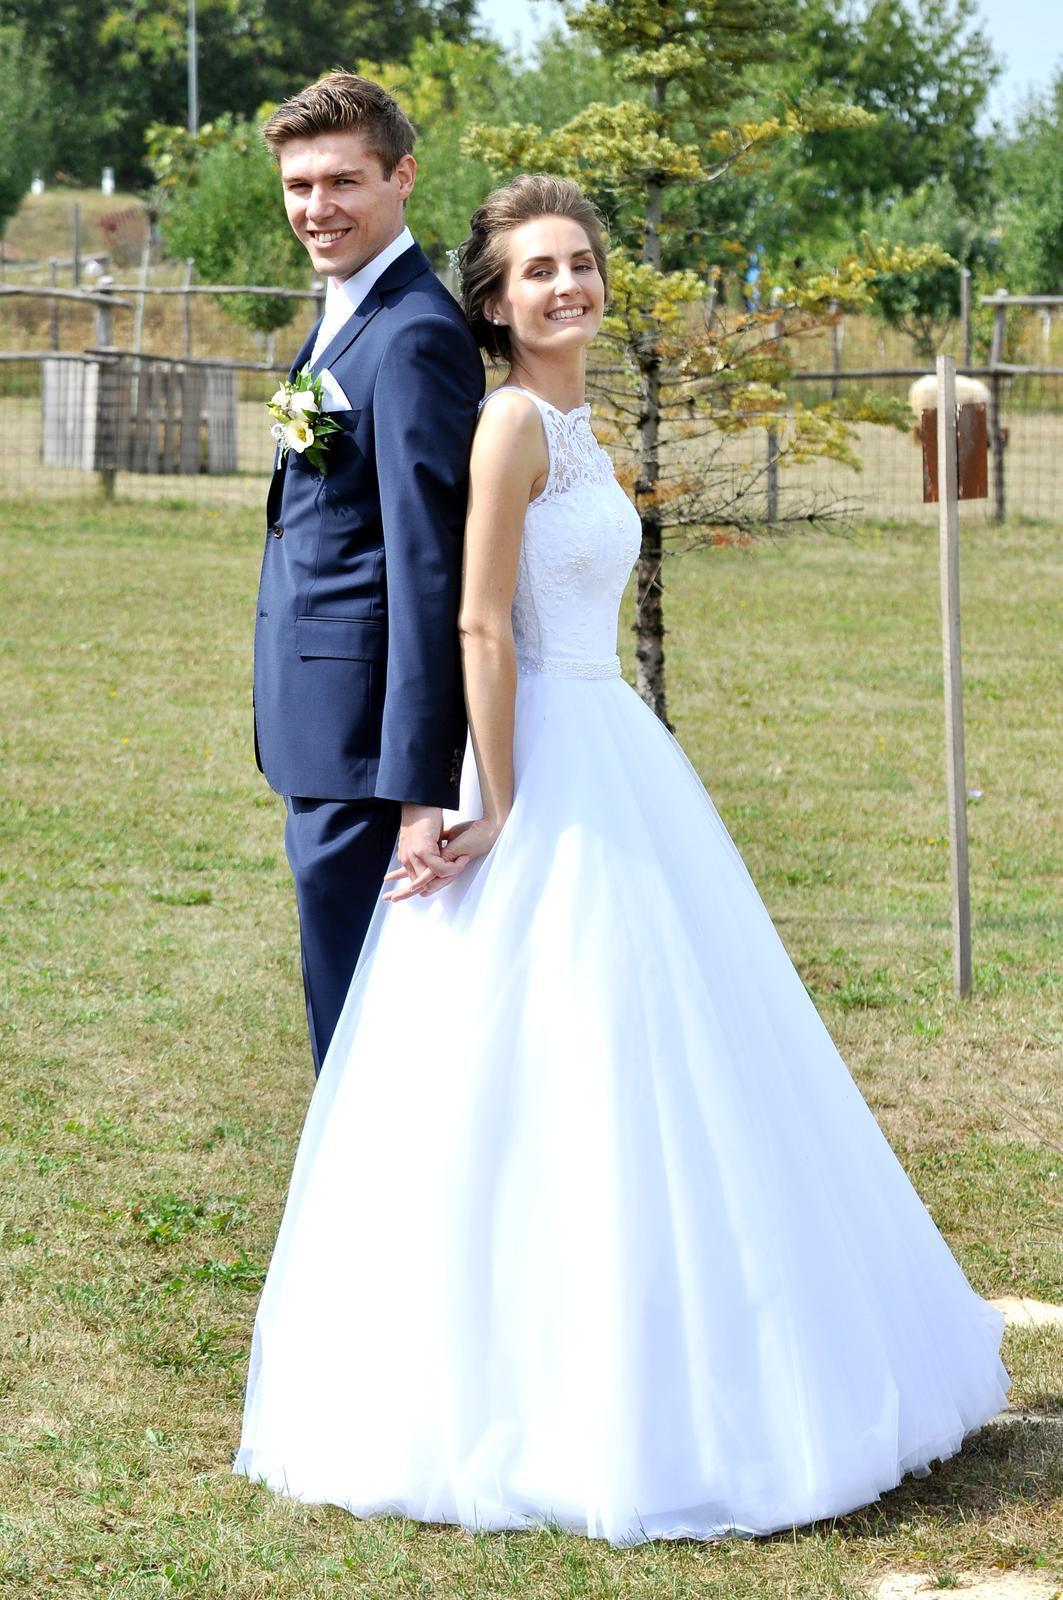 Svadobné šaty - vel.32 - Obrázok č. 2